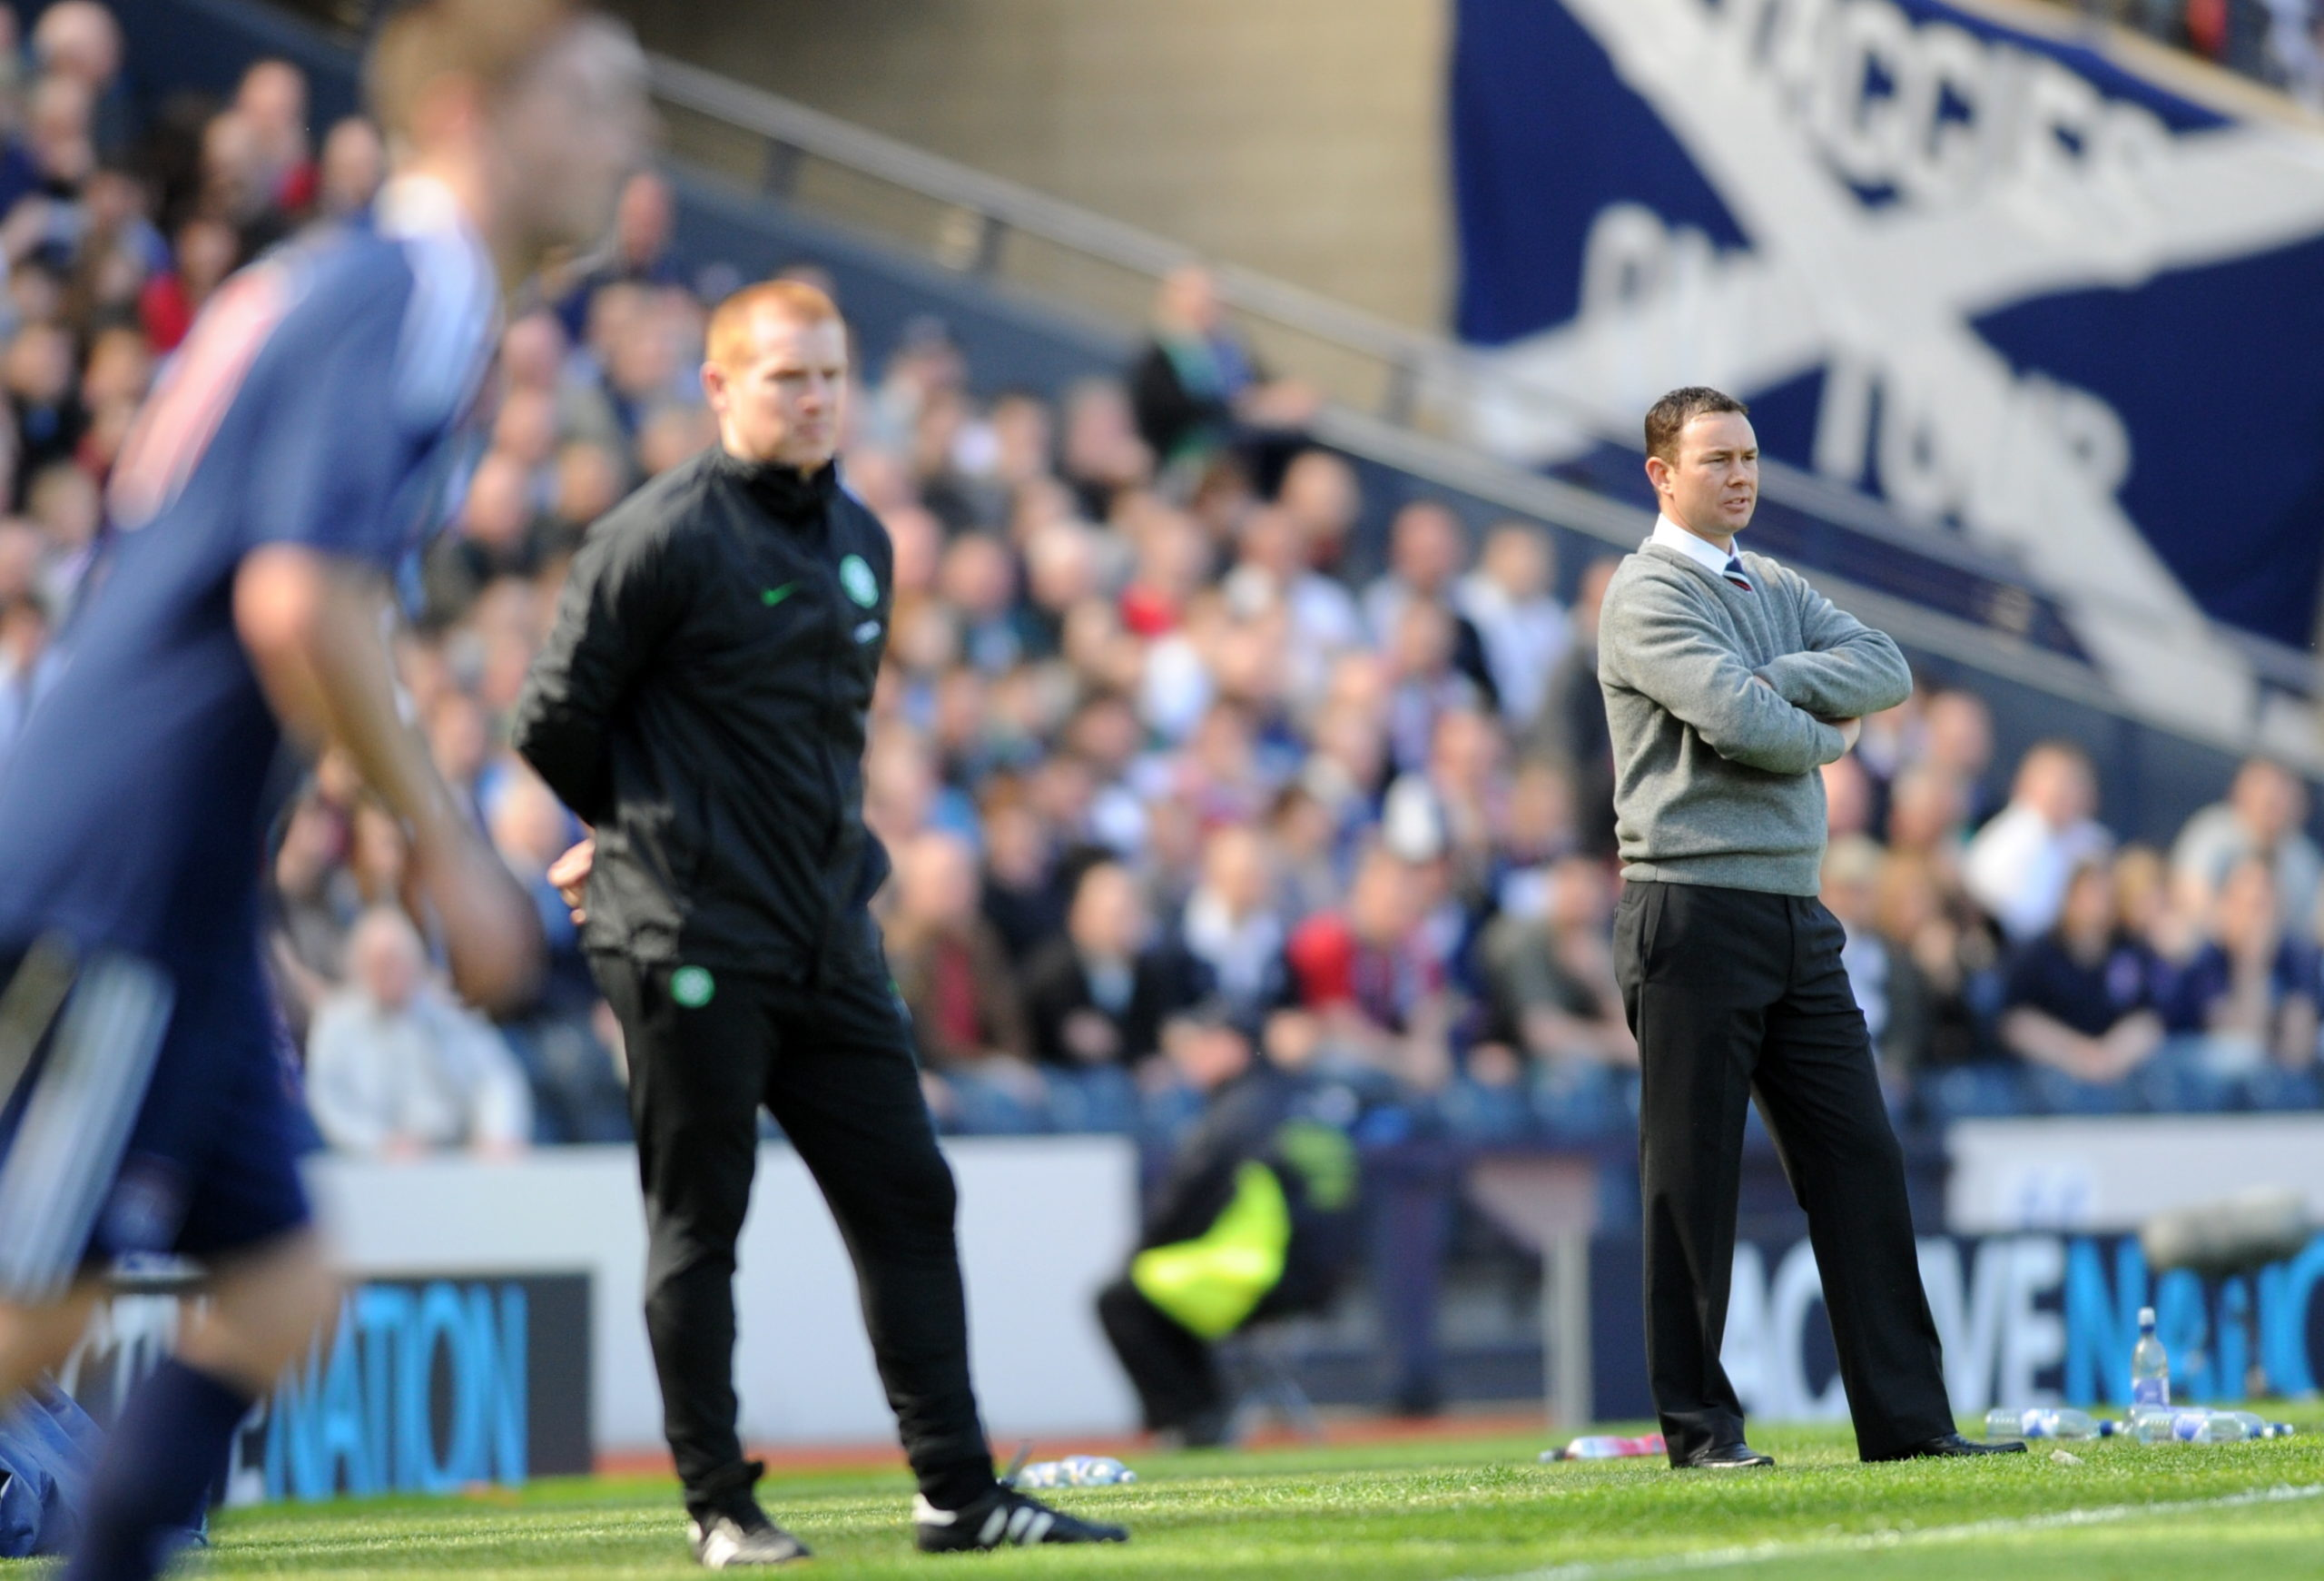 Celtic manager Neil Lennon and Ross County manager Derek Adams.